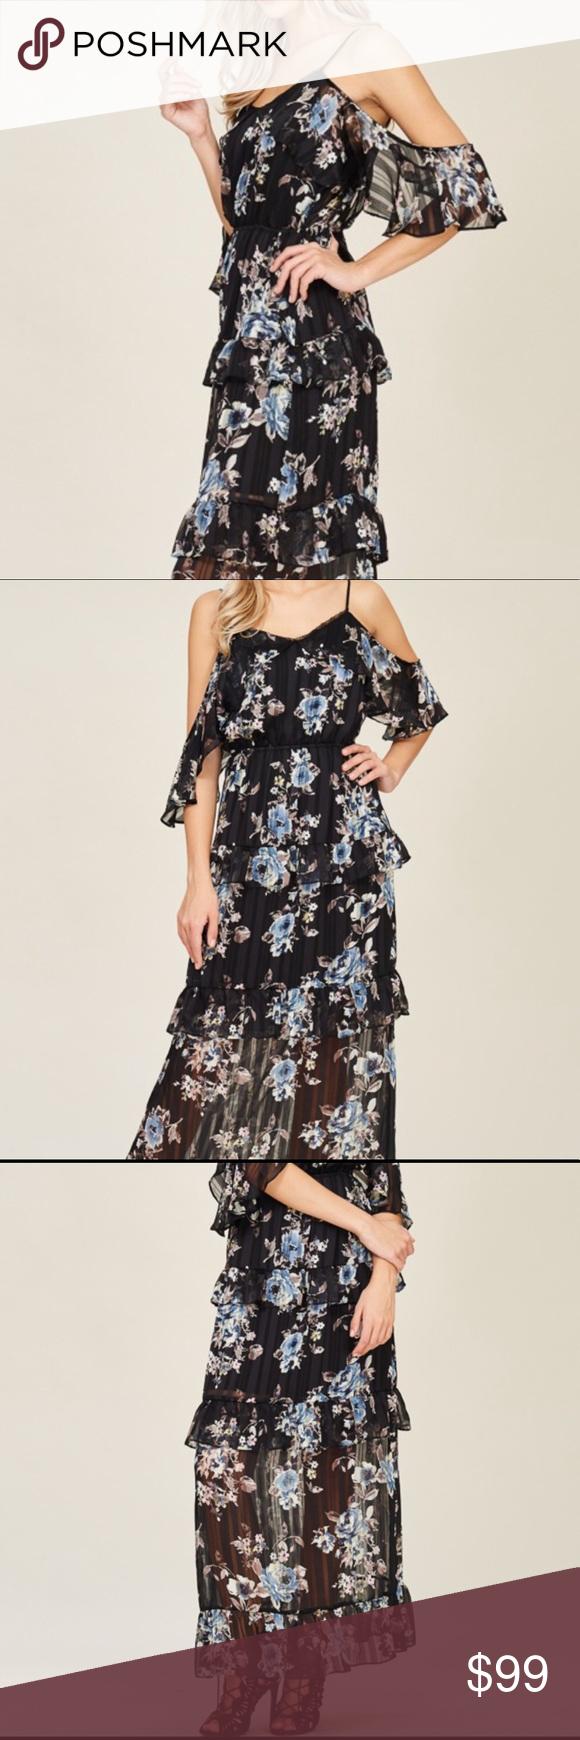 3 for $15 Black floral cold shoulder ruffle layer Black floral cold shoulder ruf…